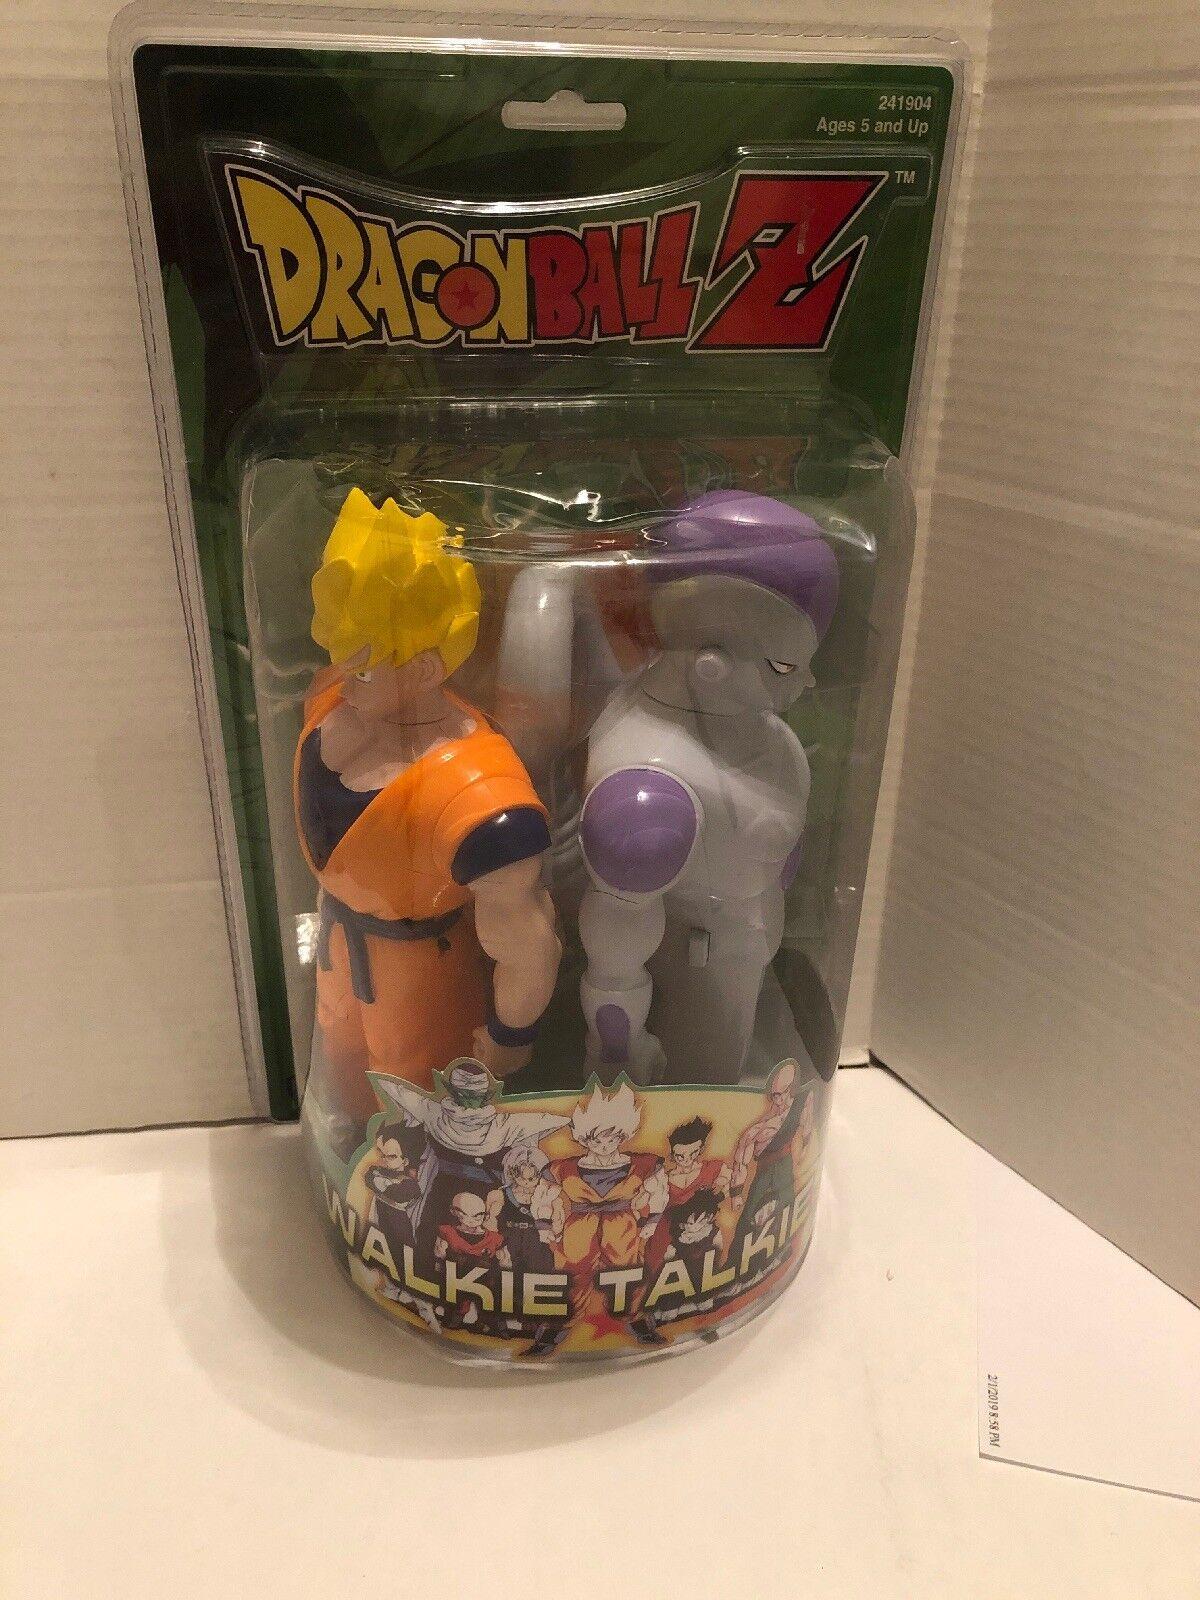 drakeboll Z promänadie Talkies Super Saiyan Goku och Frieza Ny Funimation 1999 MGA